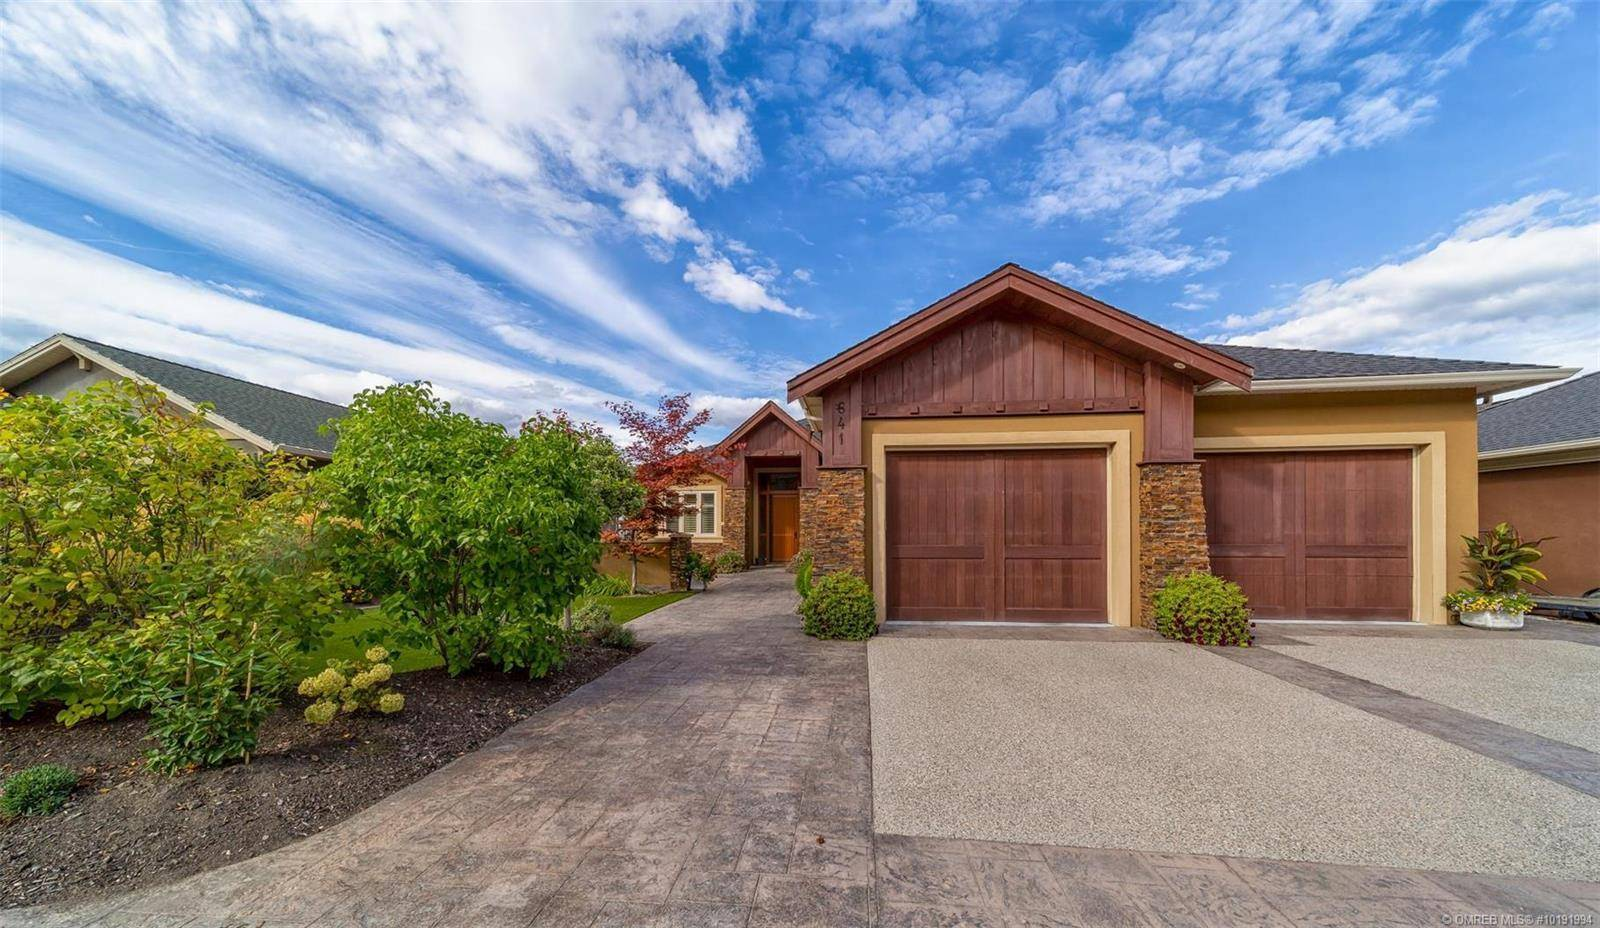 House for sale at 641 Arbor View Dr Kelowna British Columbia - MLS: 10191994